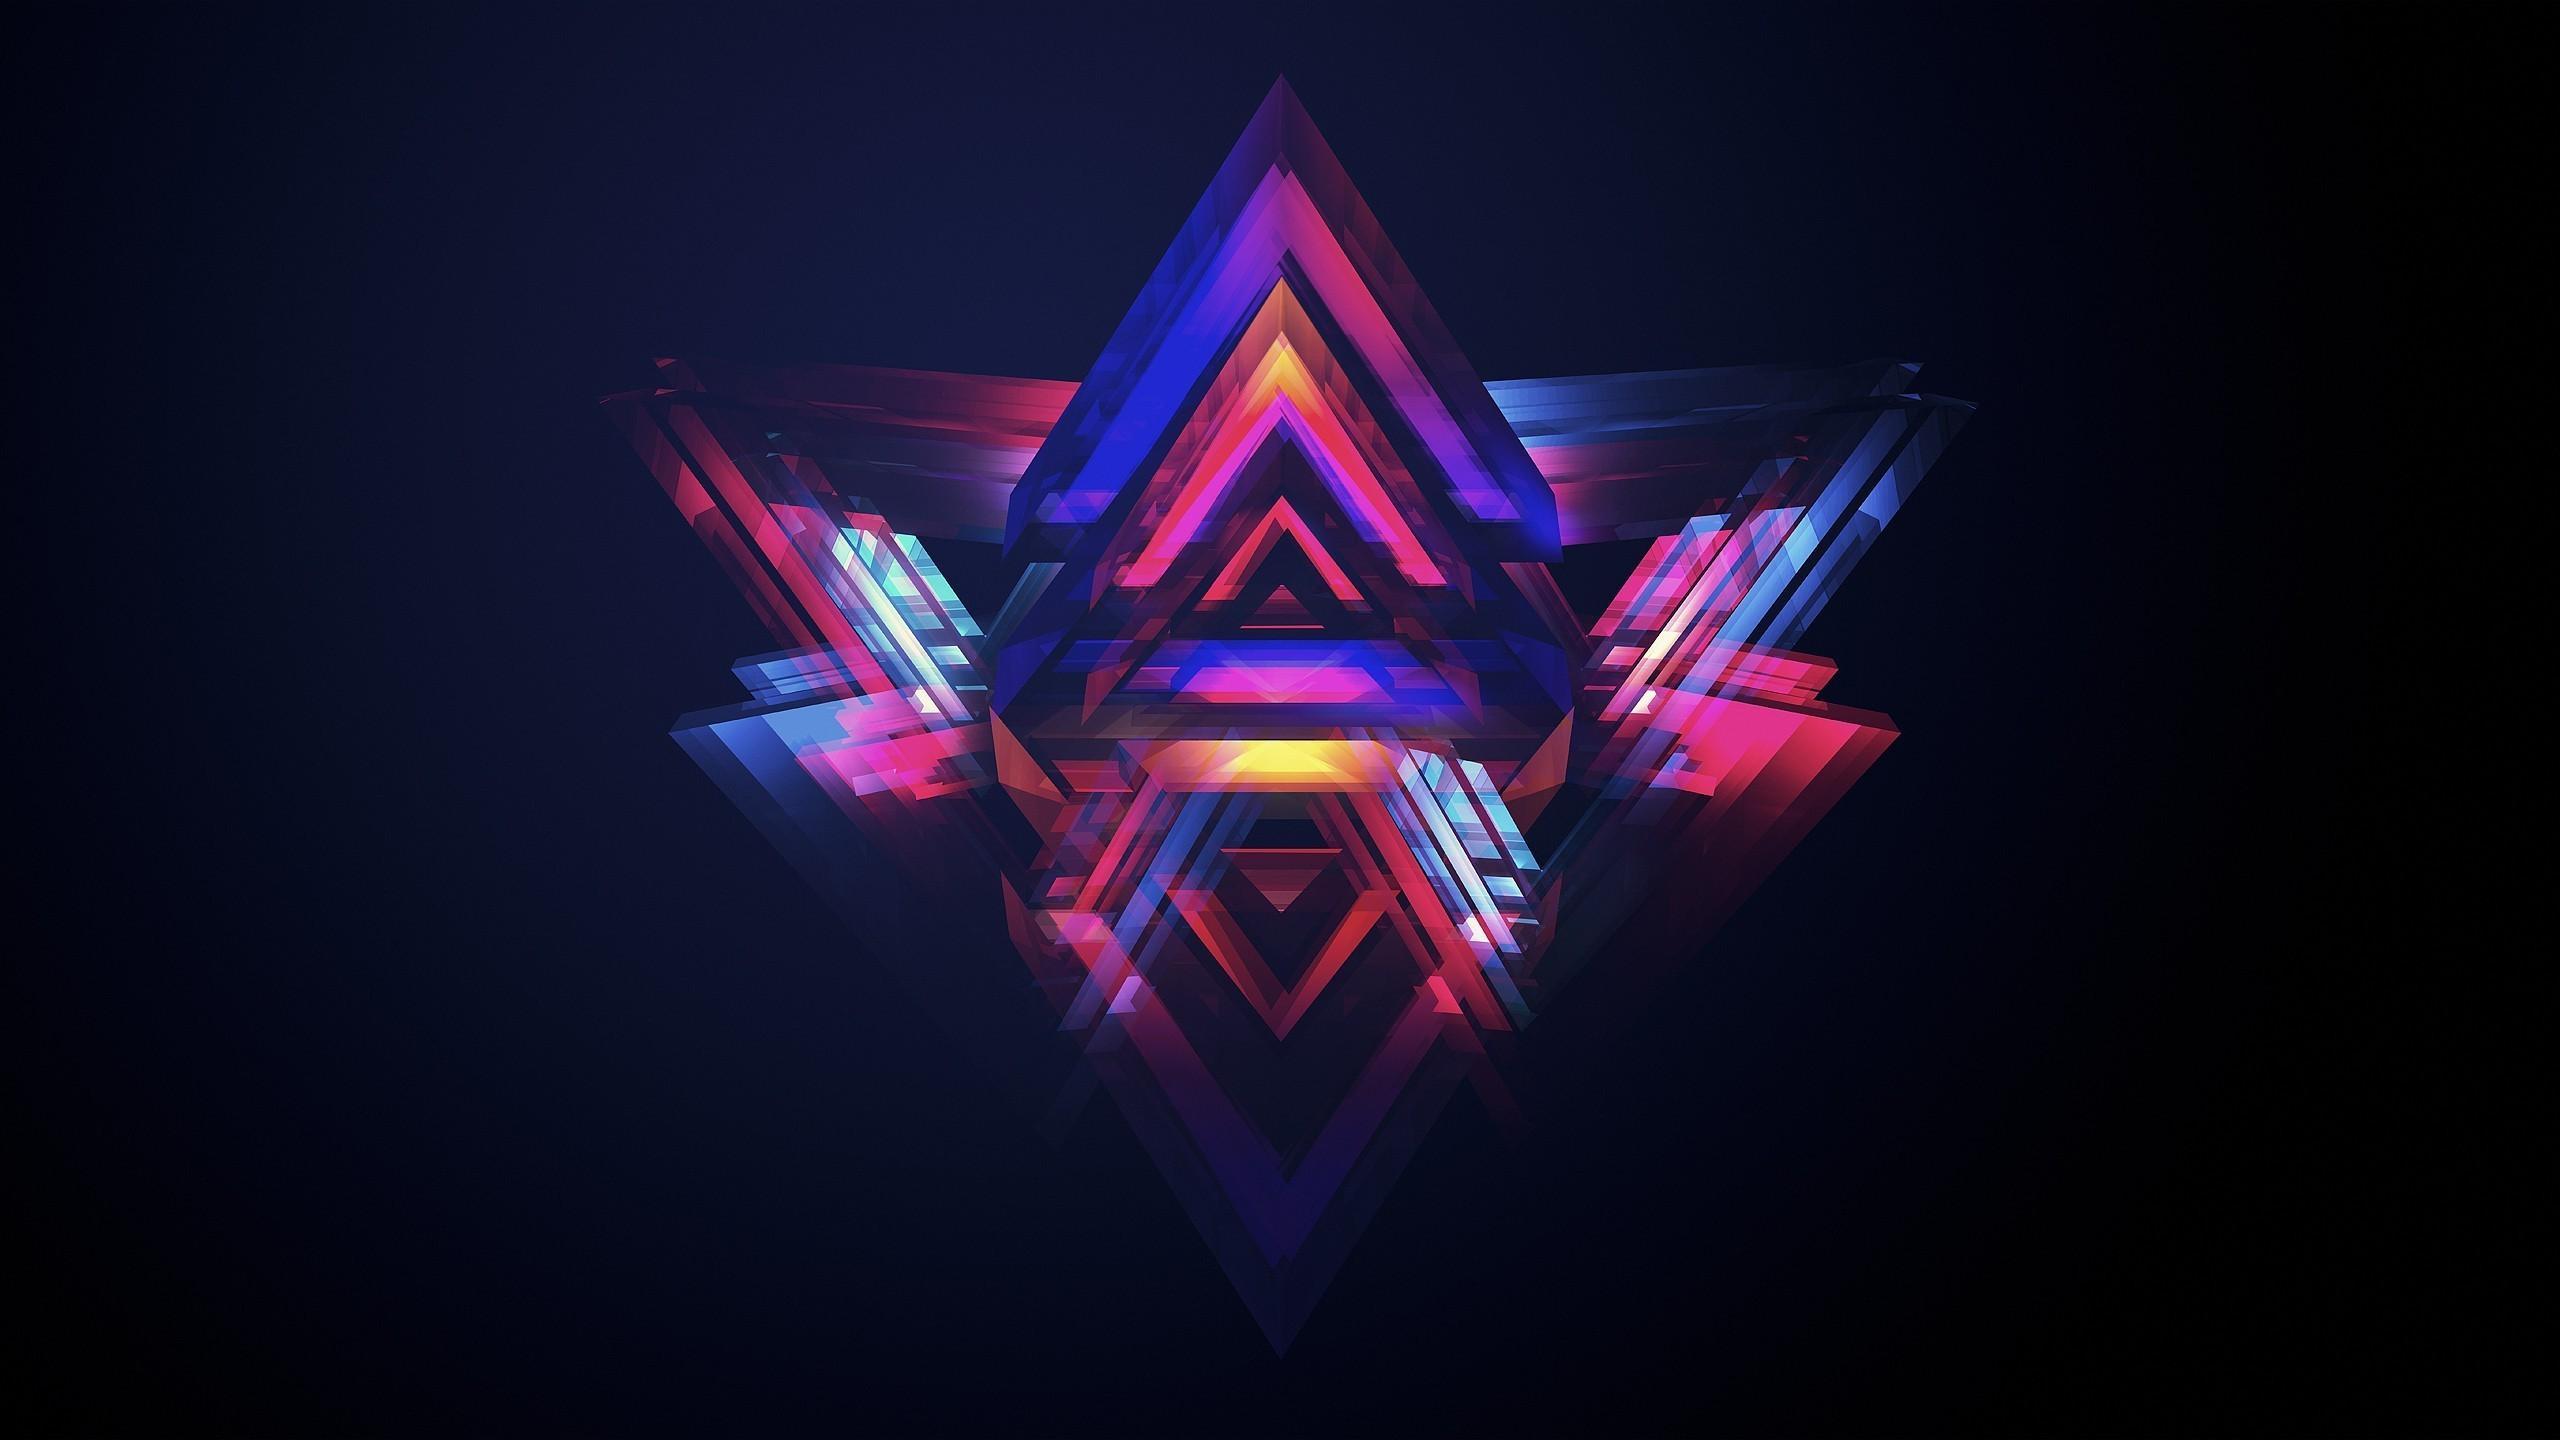 Neon pyramids Wallpaper 3371 2560x1440